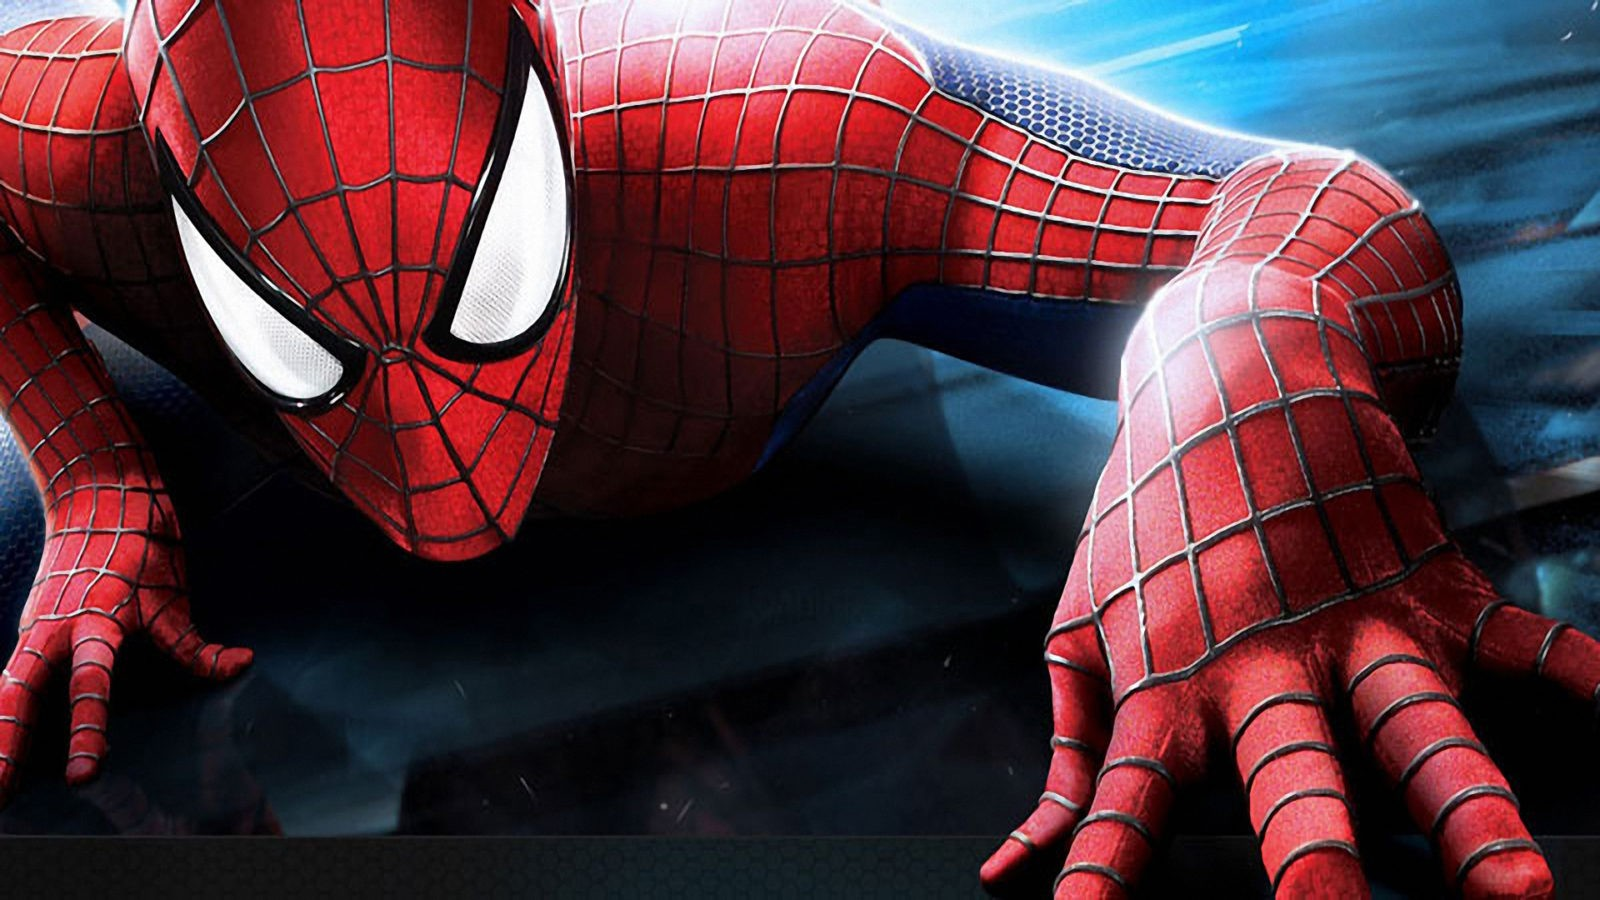 Spider-Man is Bad For Marvel's Brand